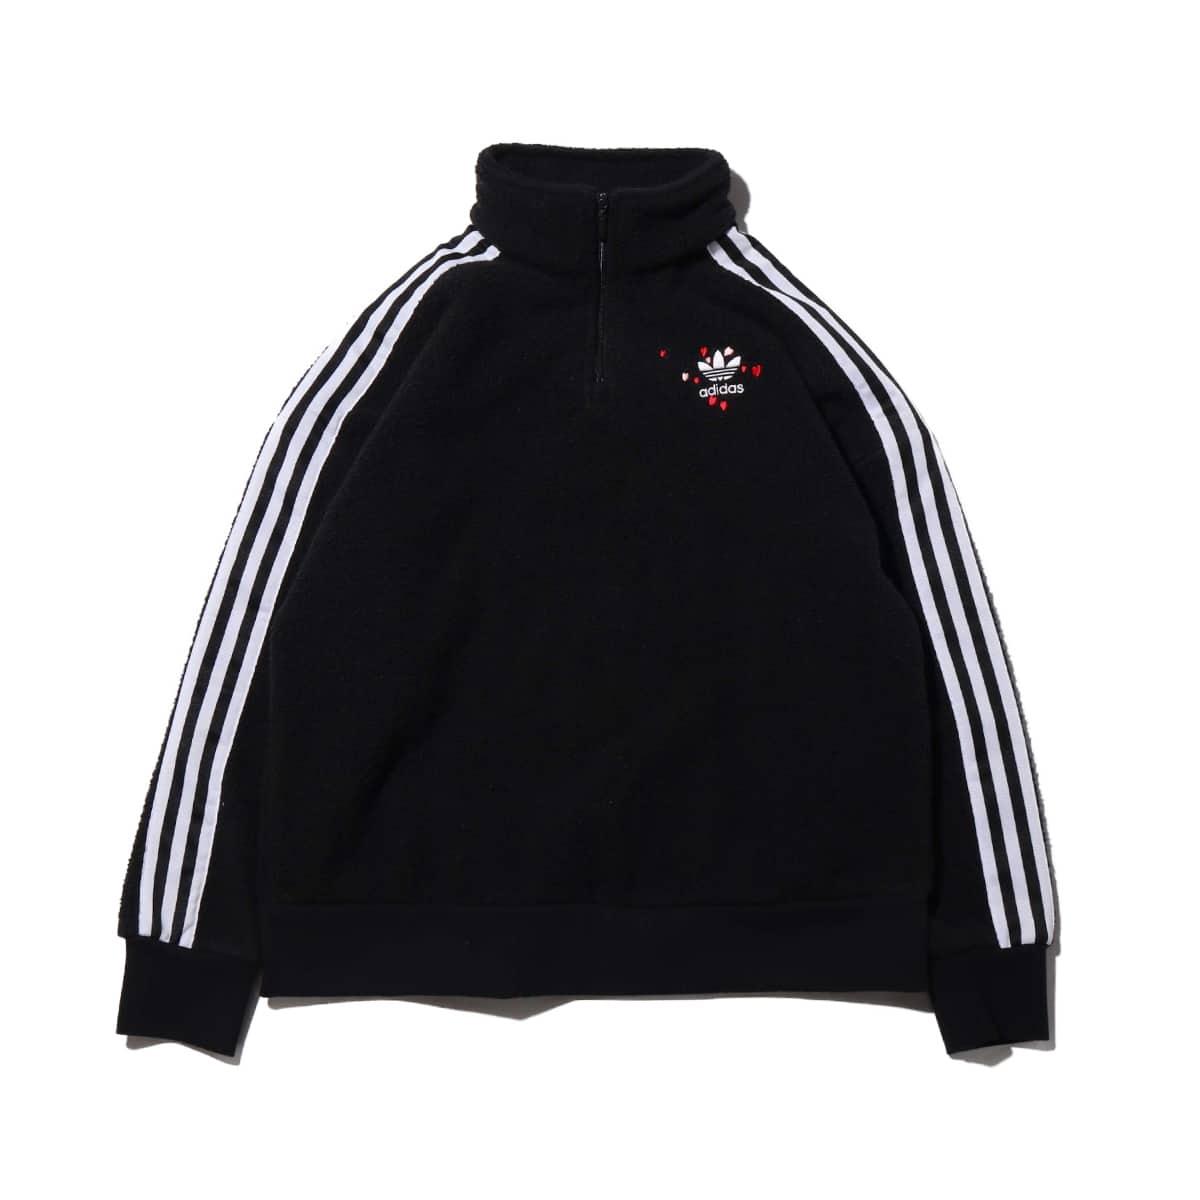 adidas HALF ZIP JACKET BLACK 20SS-S_photo_large